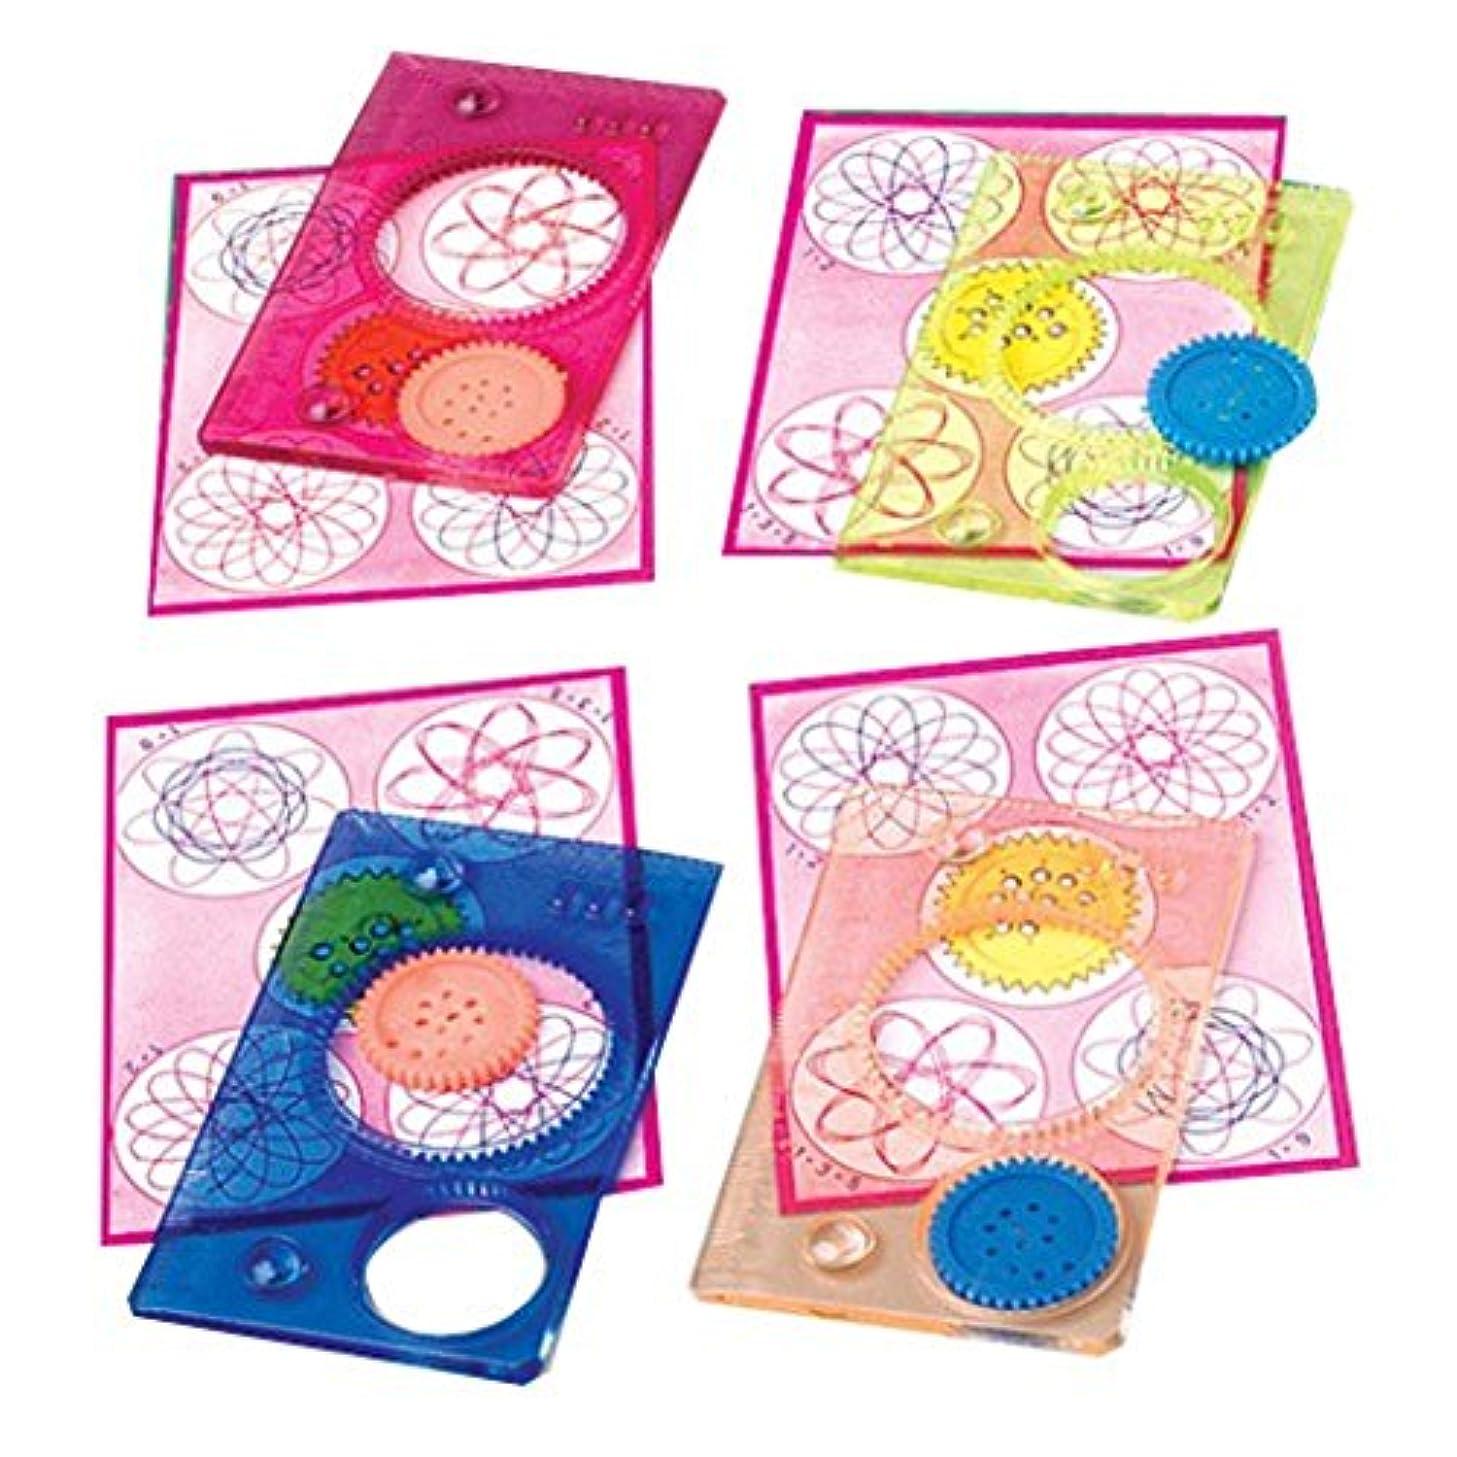 Lot Of 12 Assorted Color Plastic Spiro Spiral Stencils